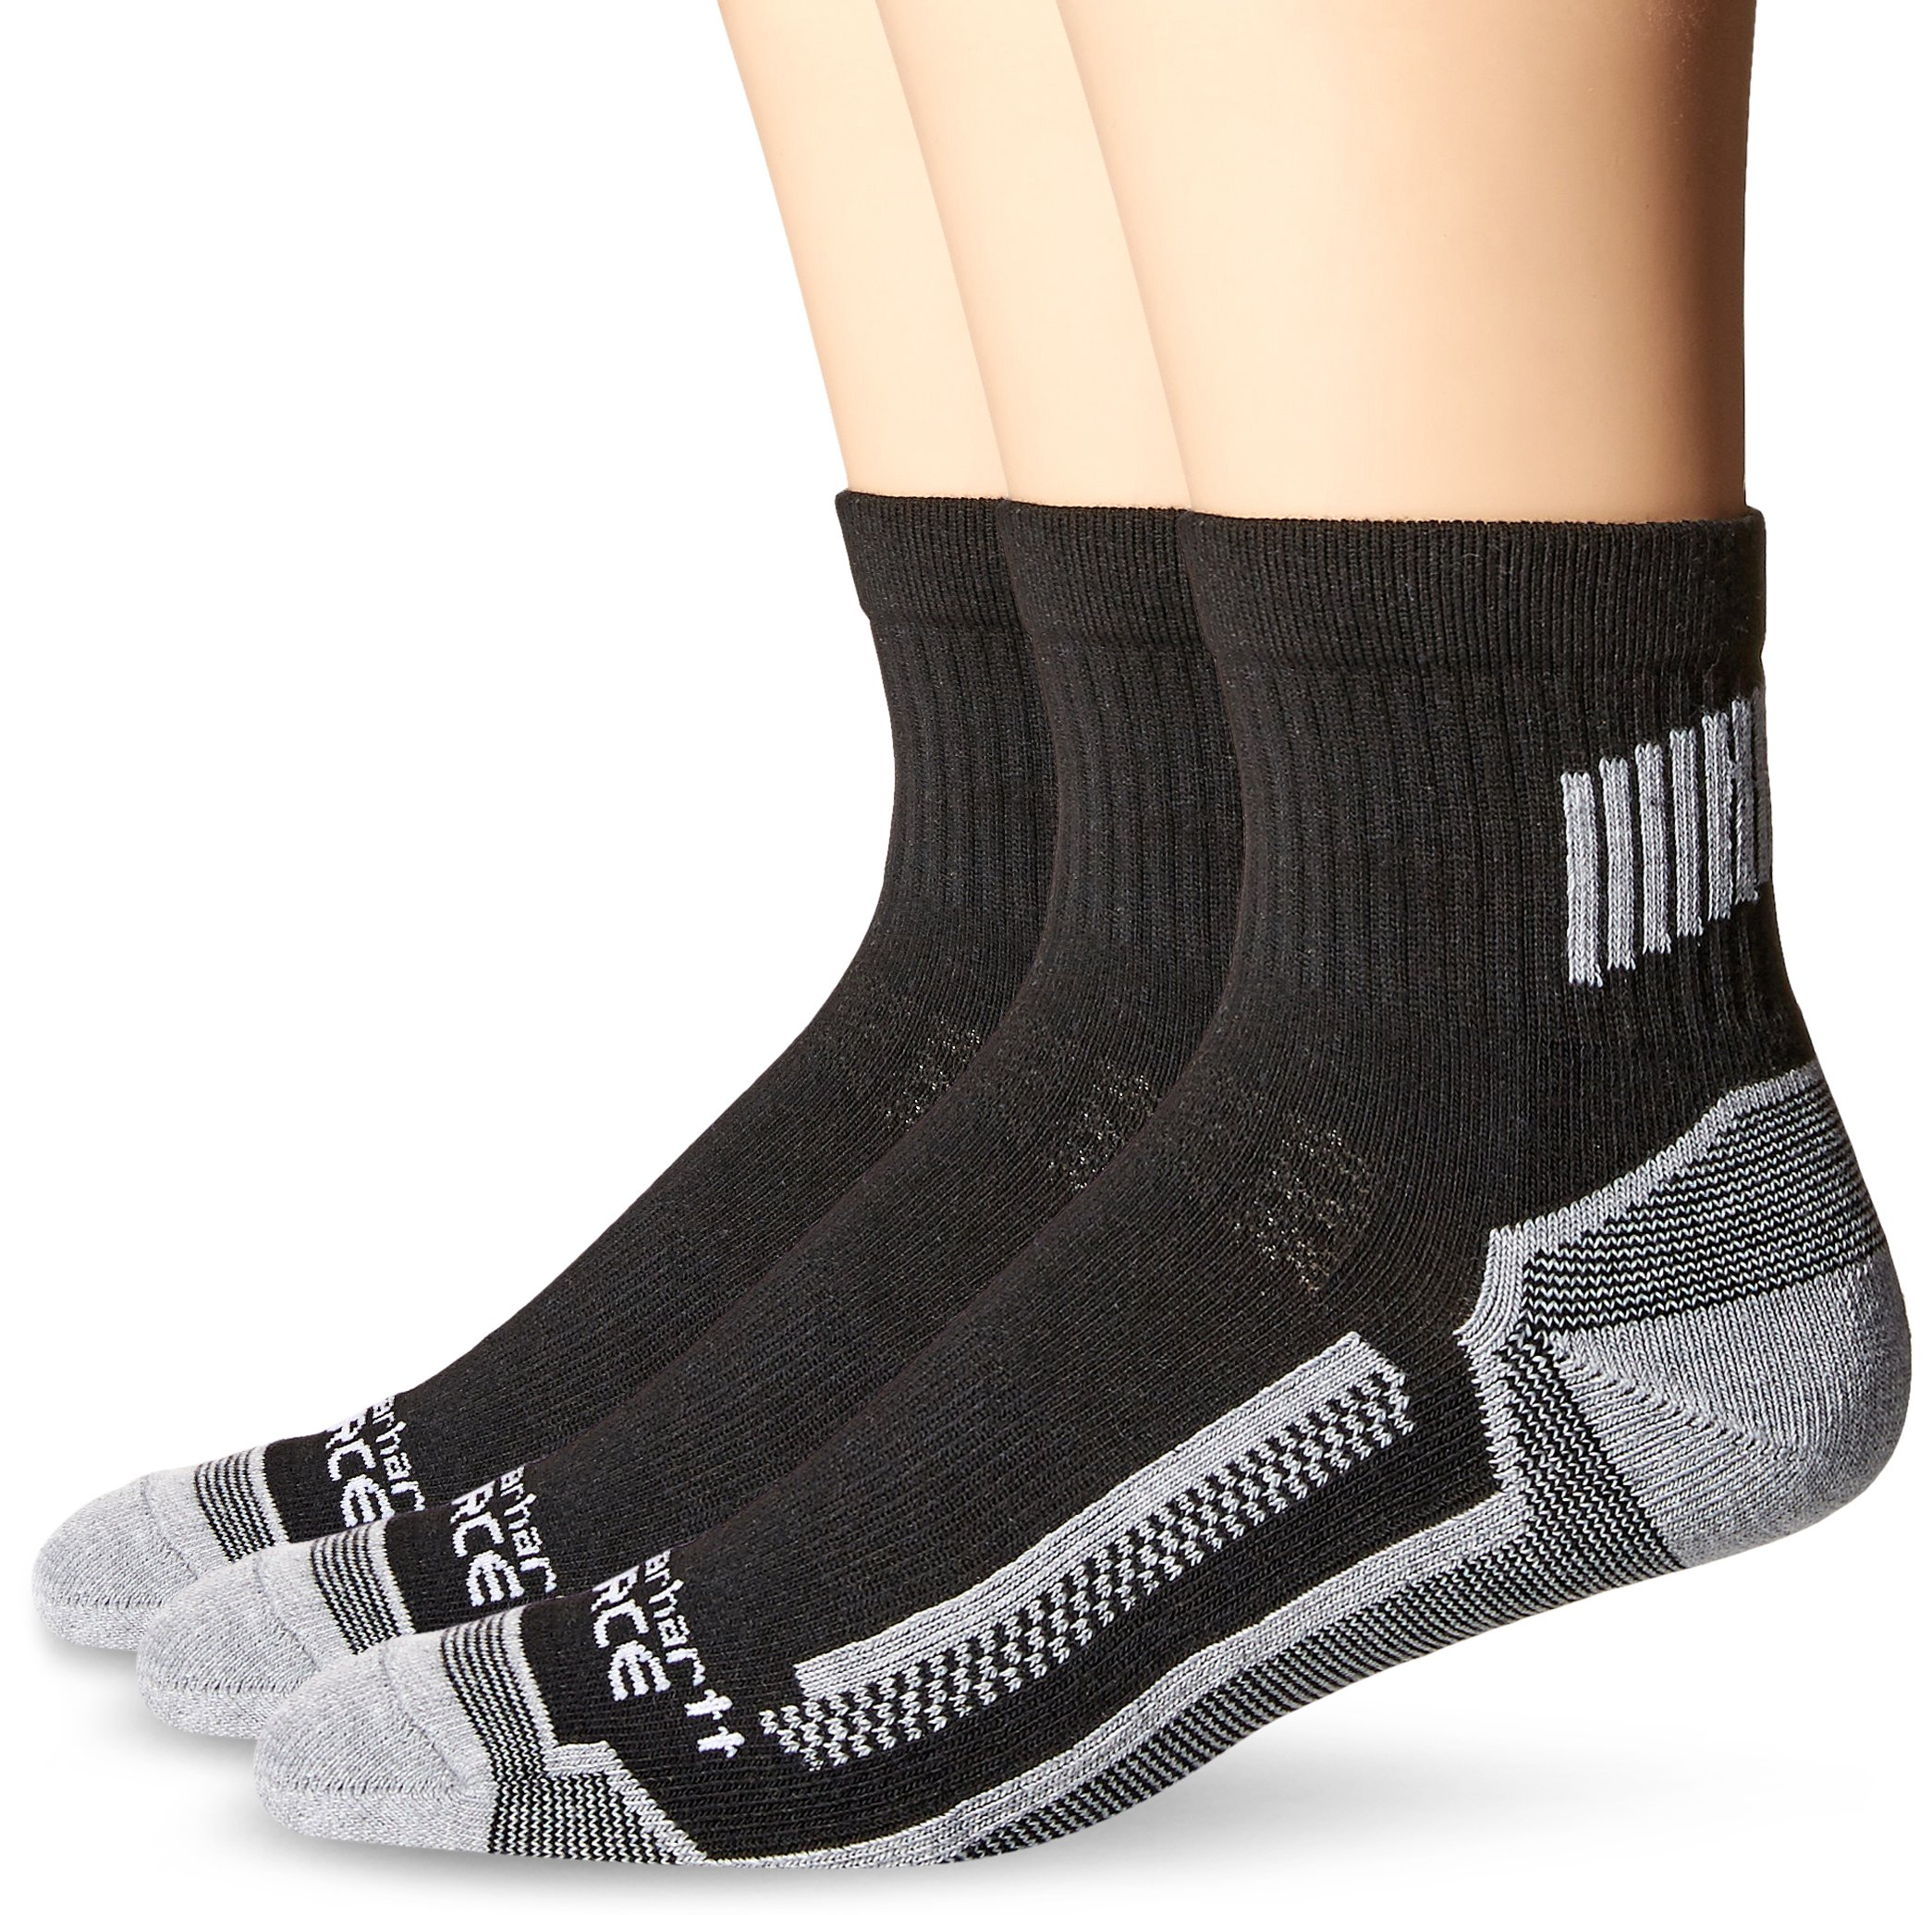 Carhartt Men's 3 Pack Force Performance Work Quarter Socks, Black, Sock Size:10-13/Shoe Size: 6-12